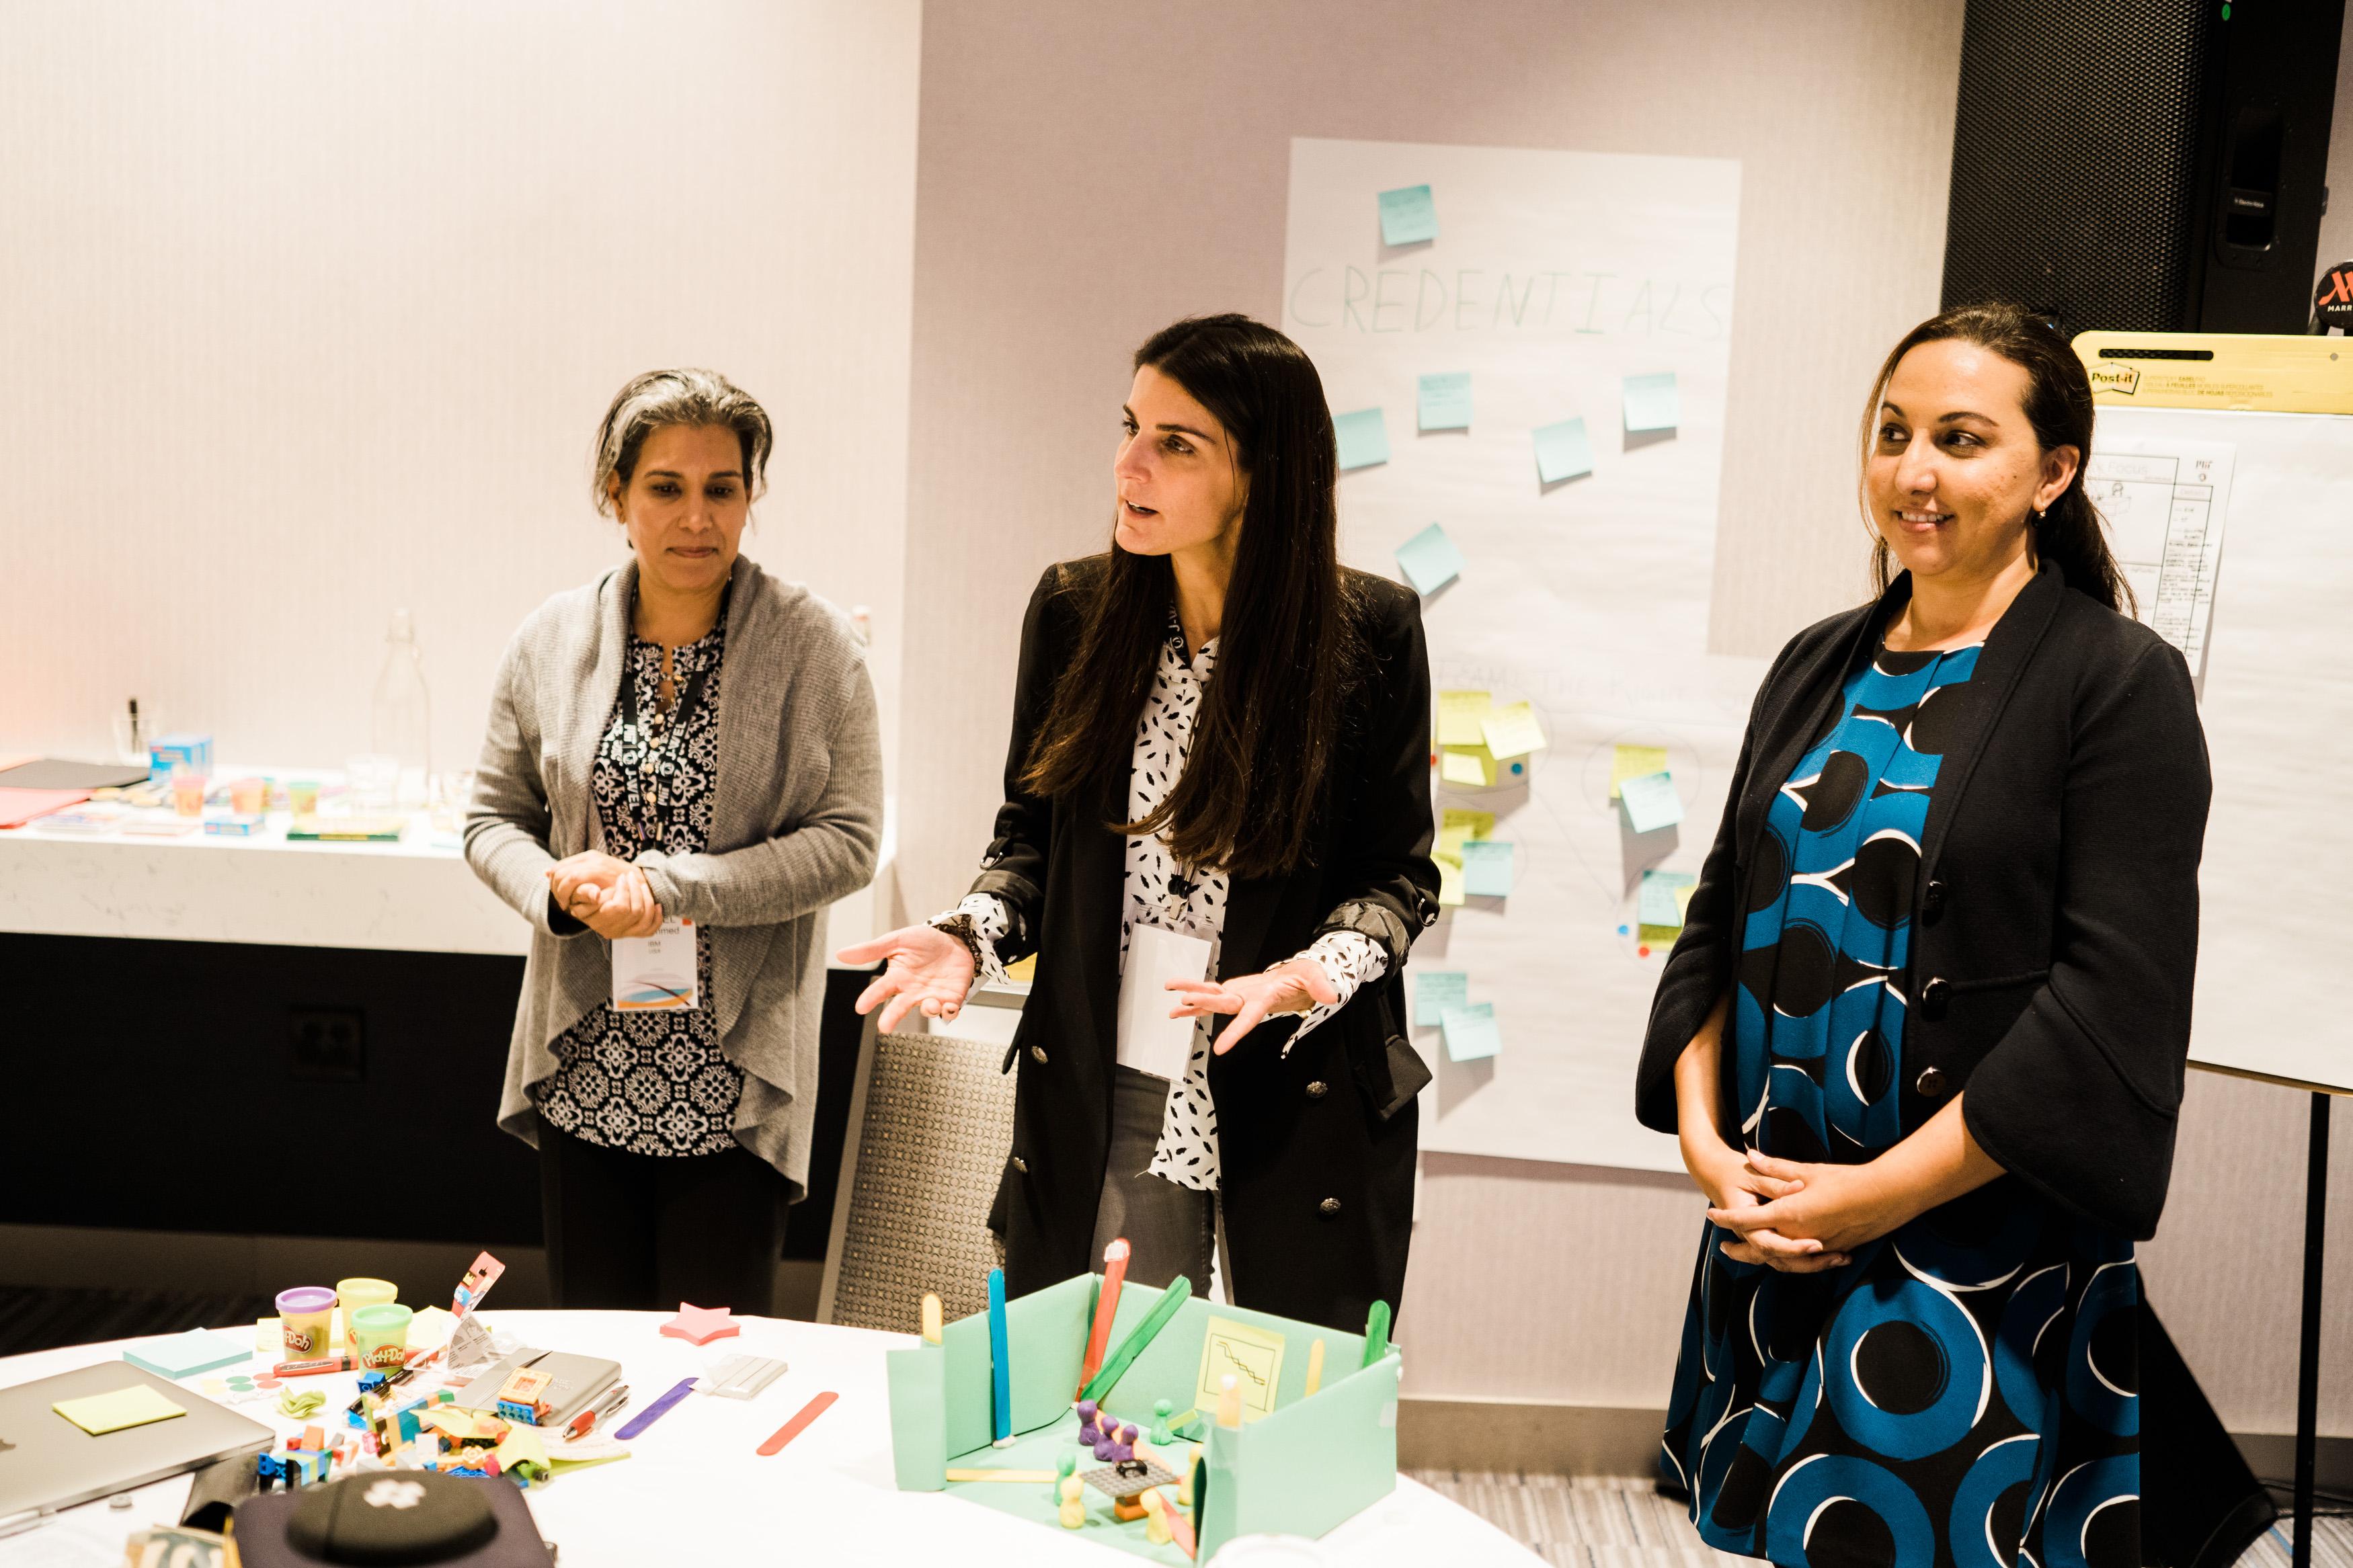 J-WEL Week: addressing the global skills gap